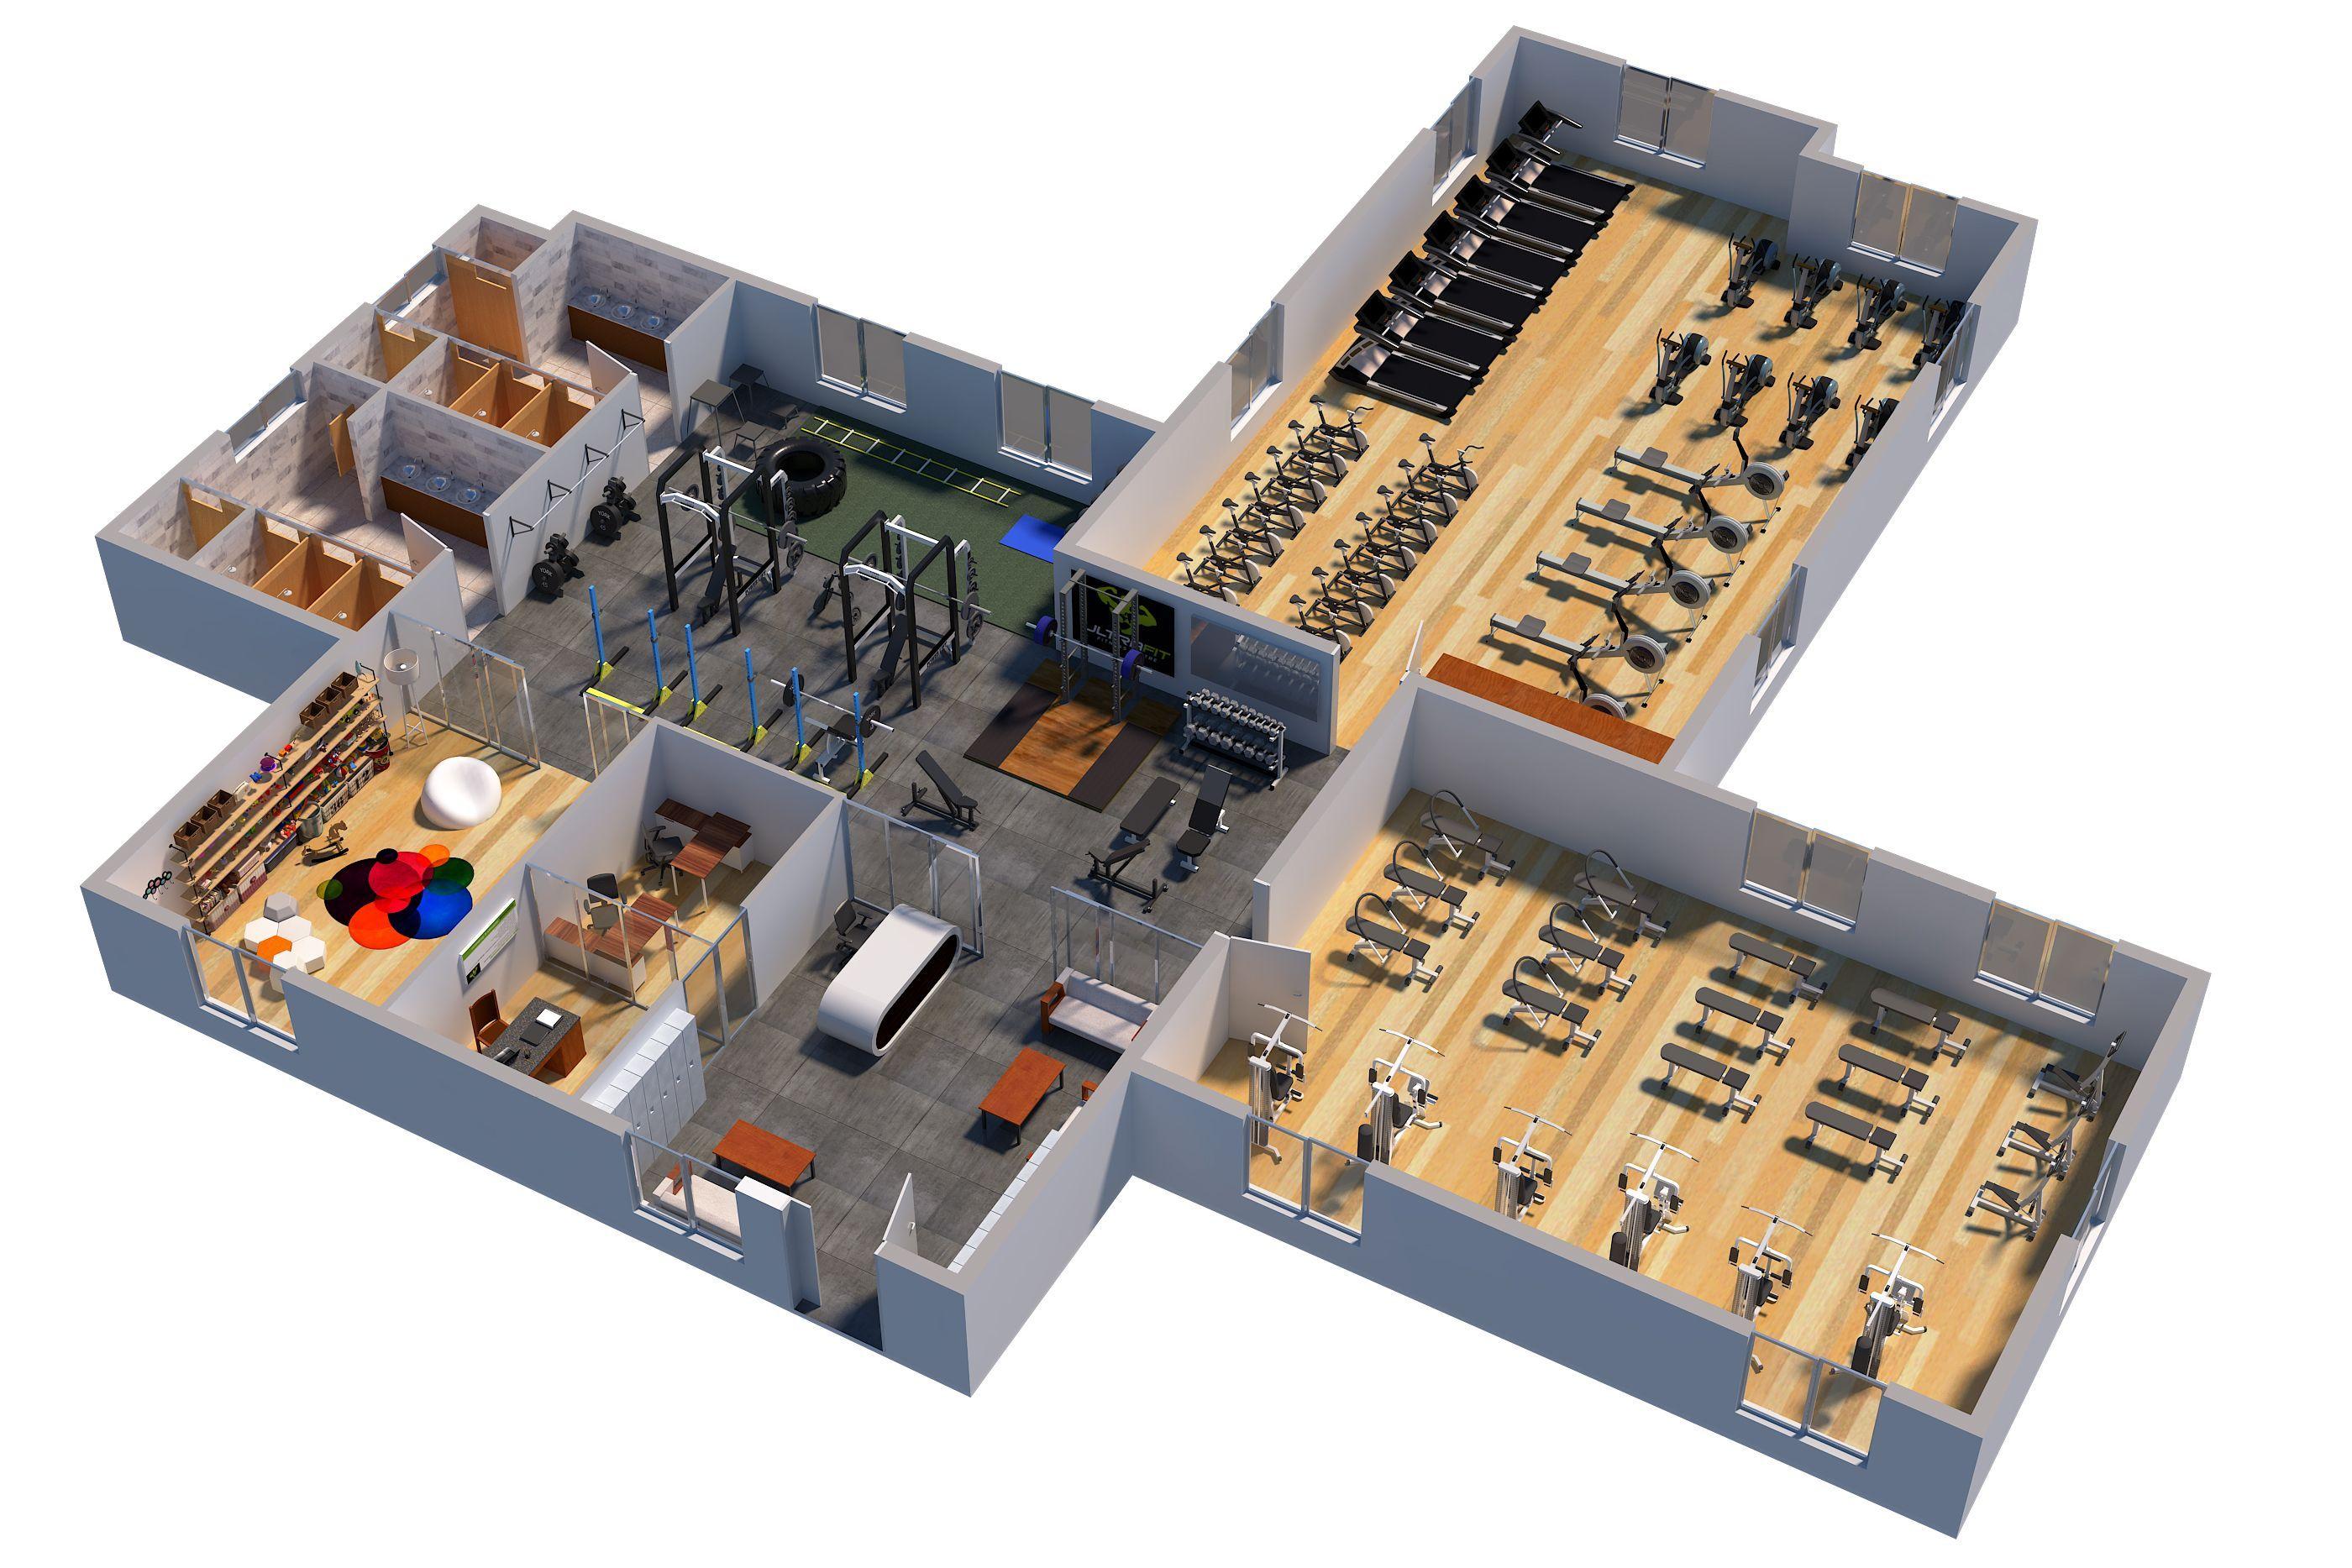 Fitness Gym Plan Architecture Plan Gym Architecture Gym Plan Gym Architecture Gym Design Interior